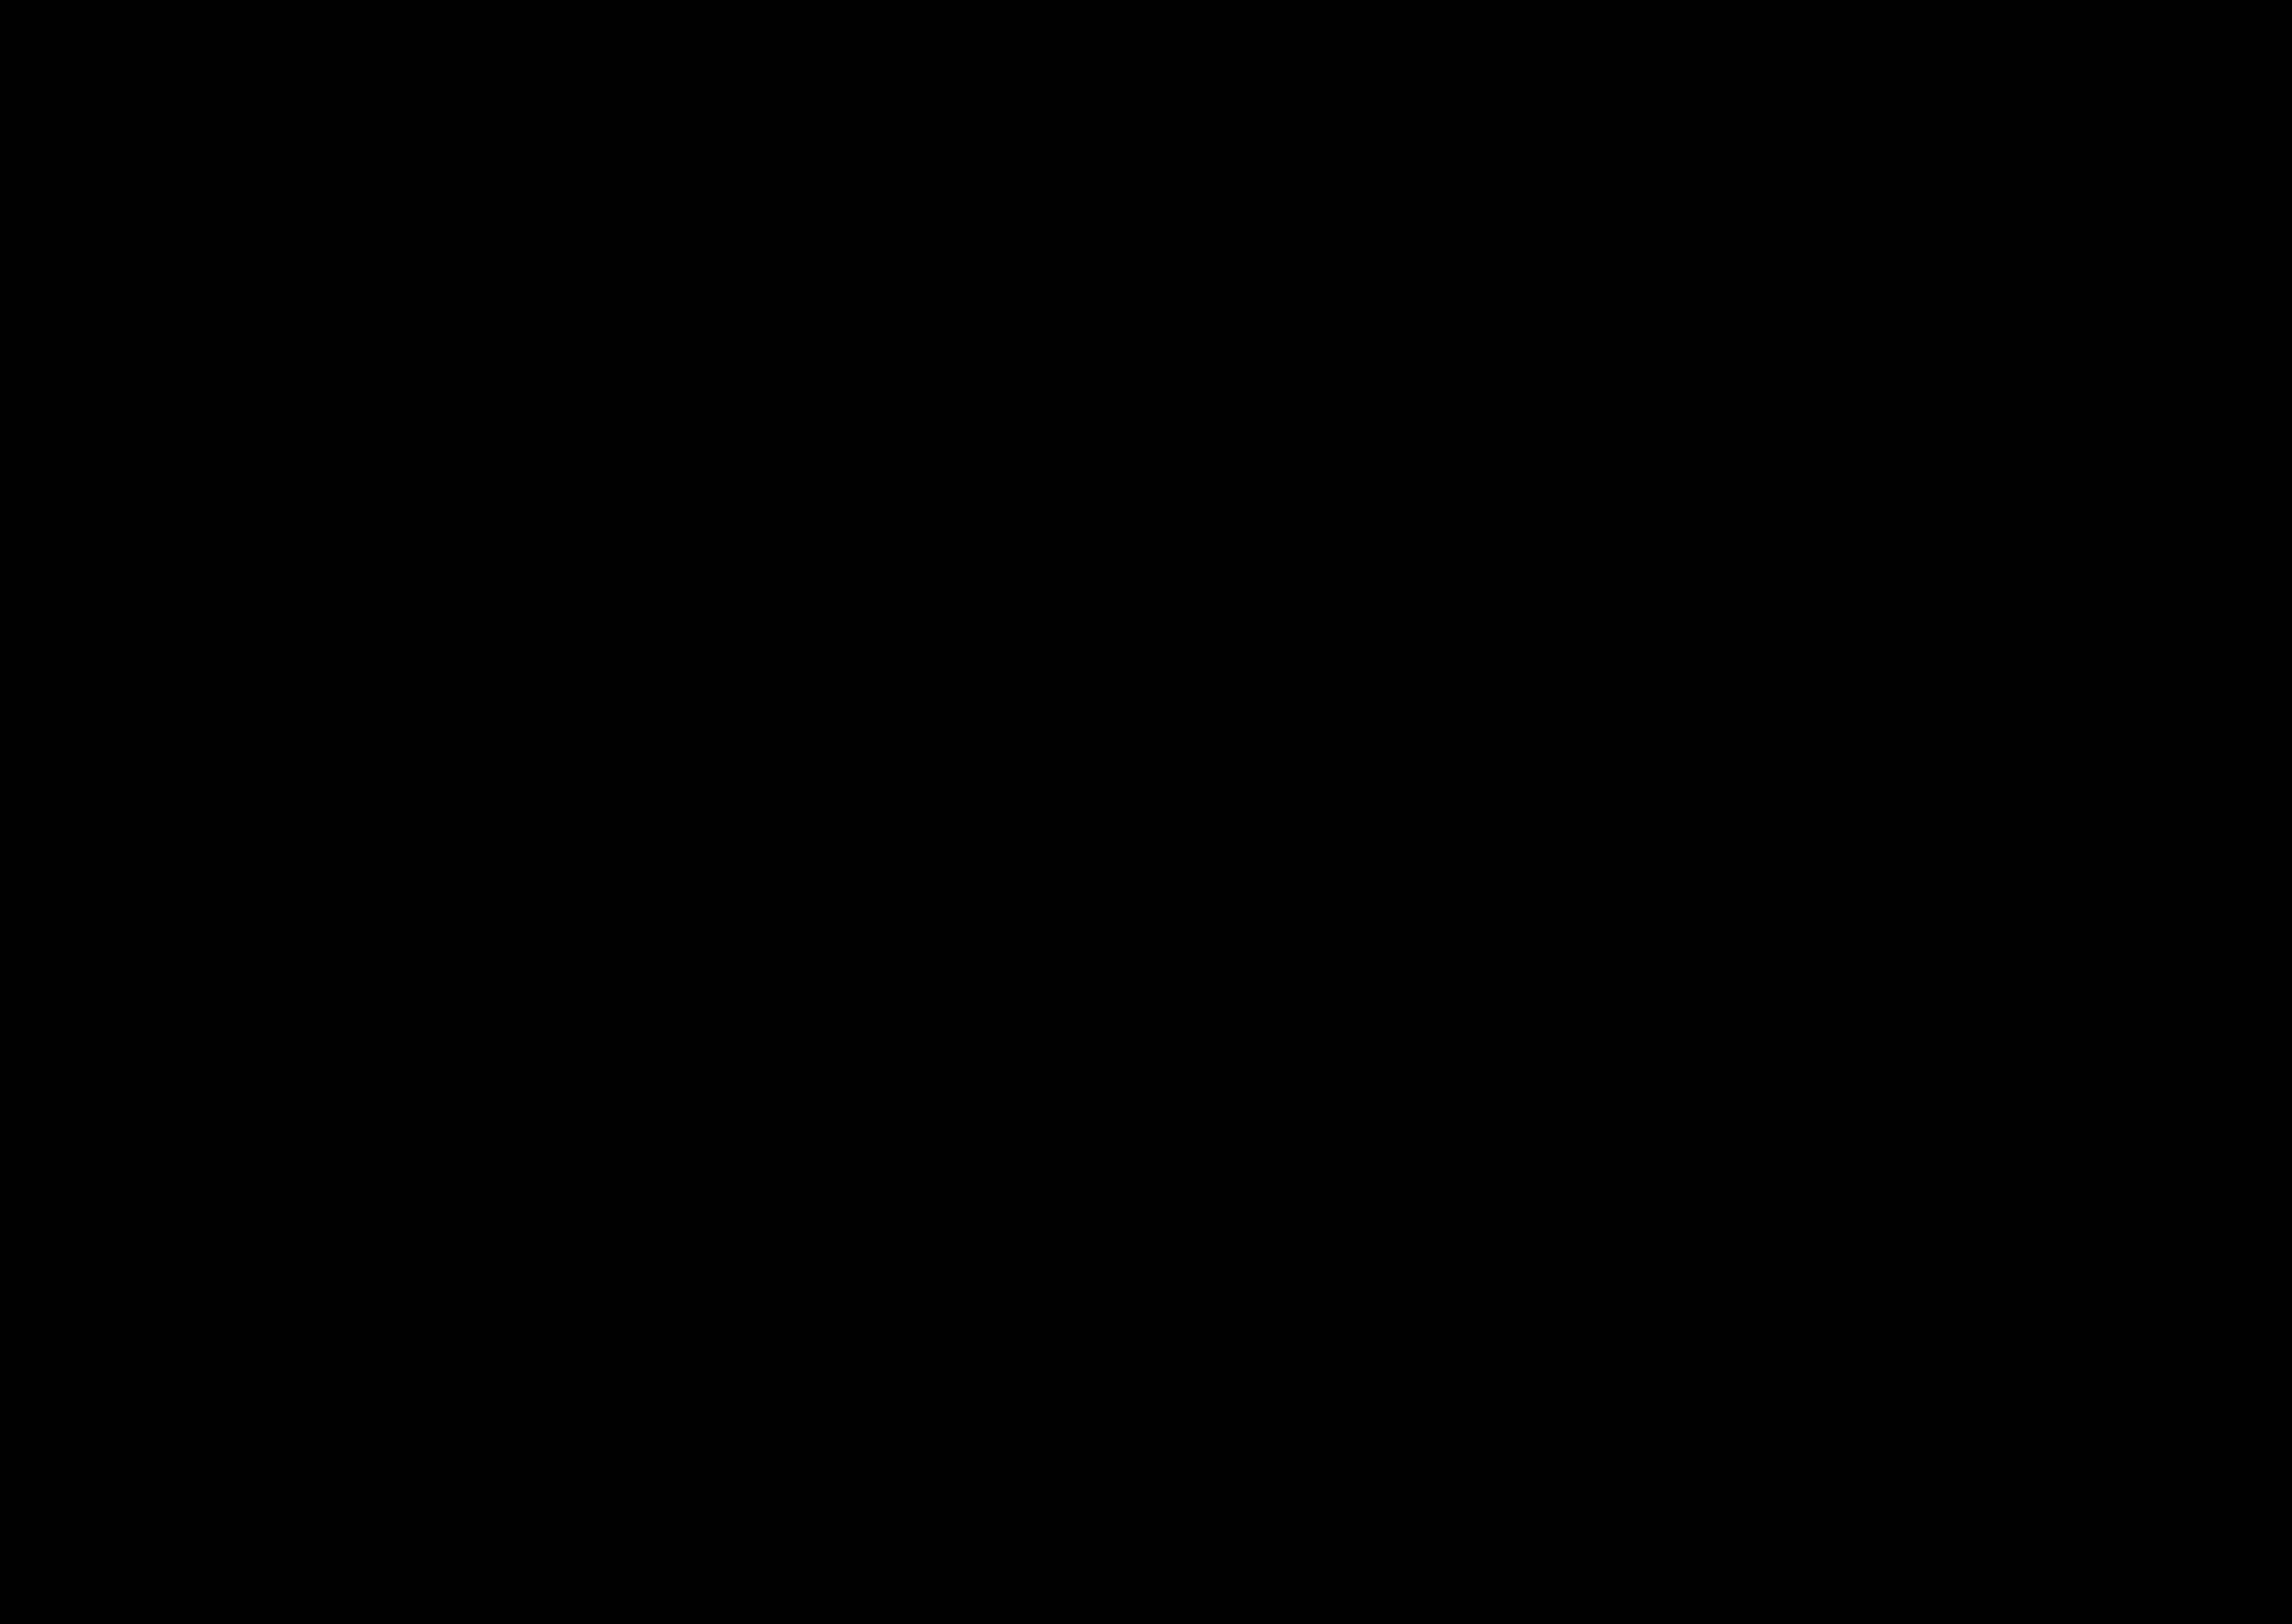 Symbols for data